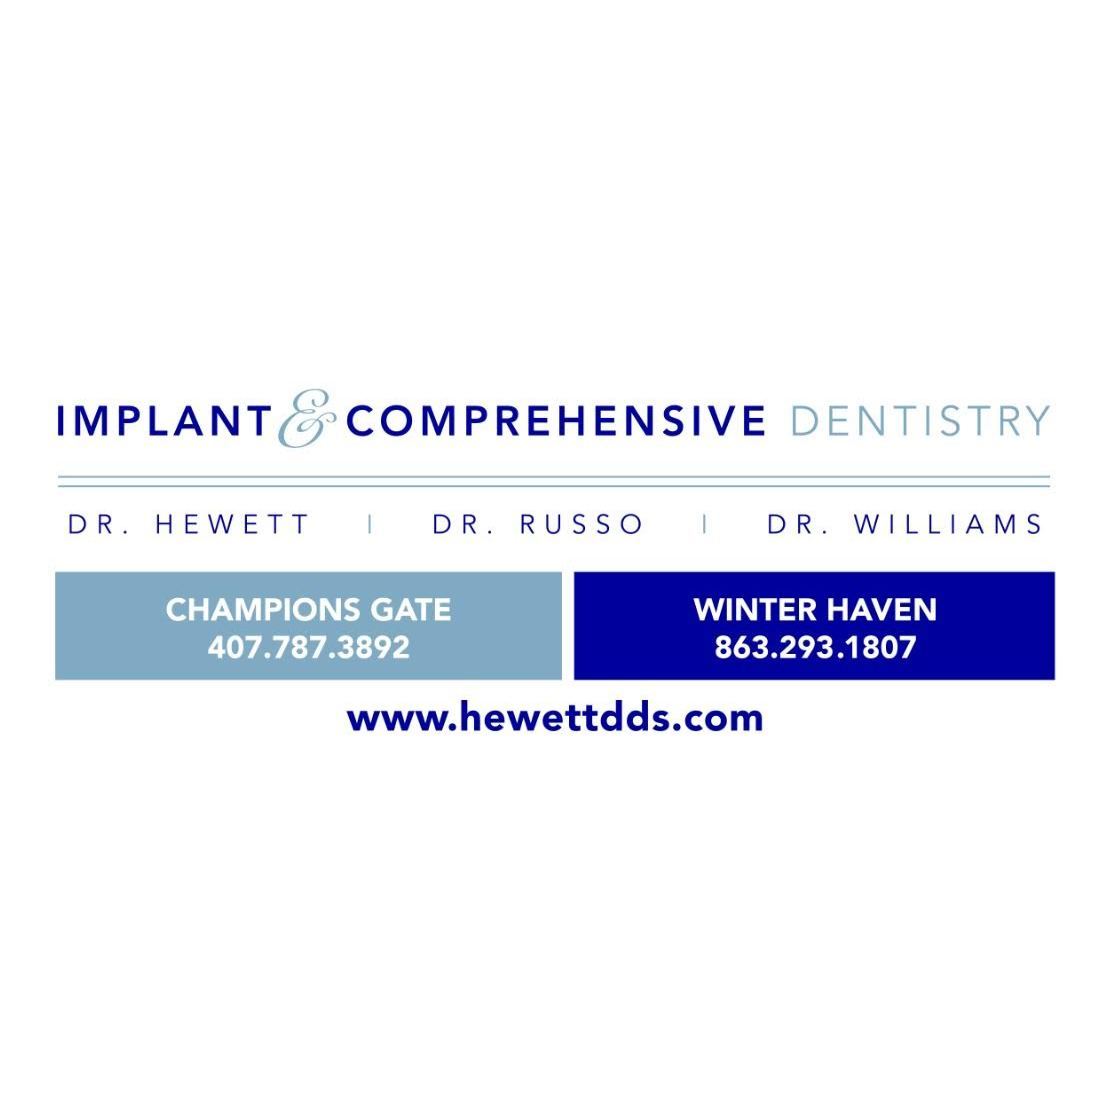 Implant & Comprehensive Dentistry